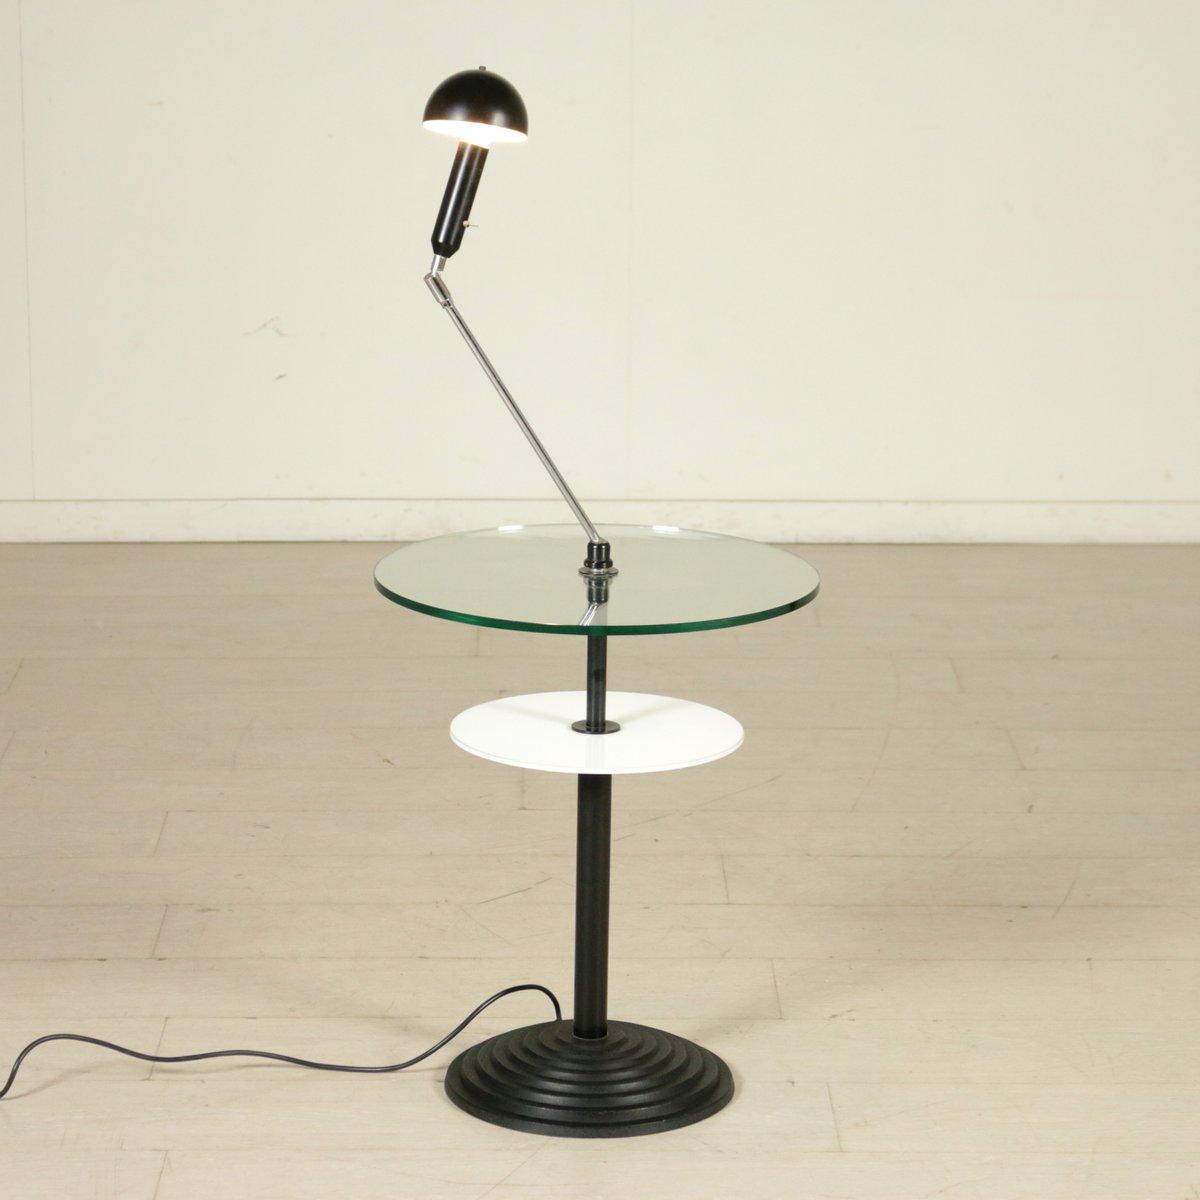 lampadaire model altair 2755 avec table par daniela puppa franco raggi pour fontana arte 1988. Black Bedroom Furniture Sets. Home Design Ideas